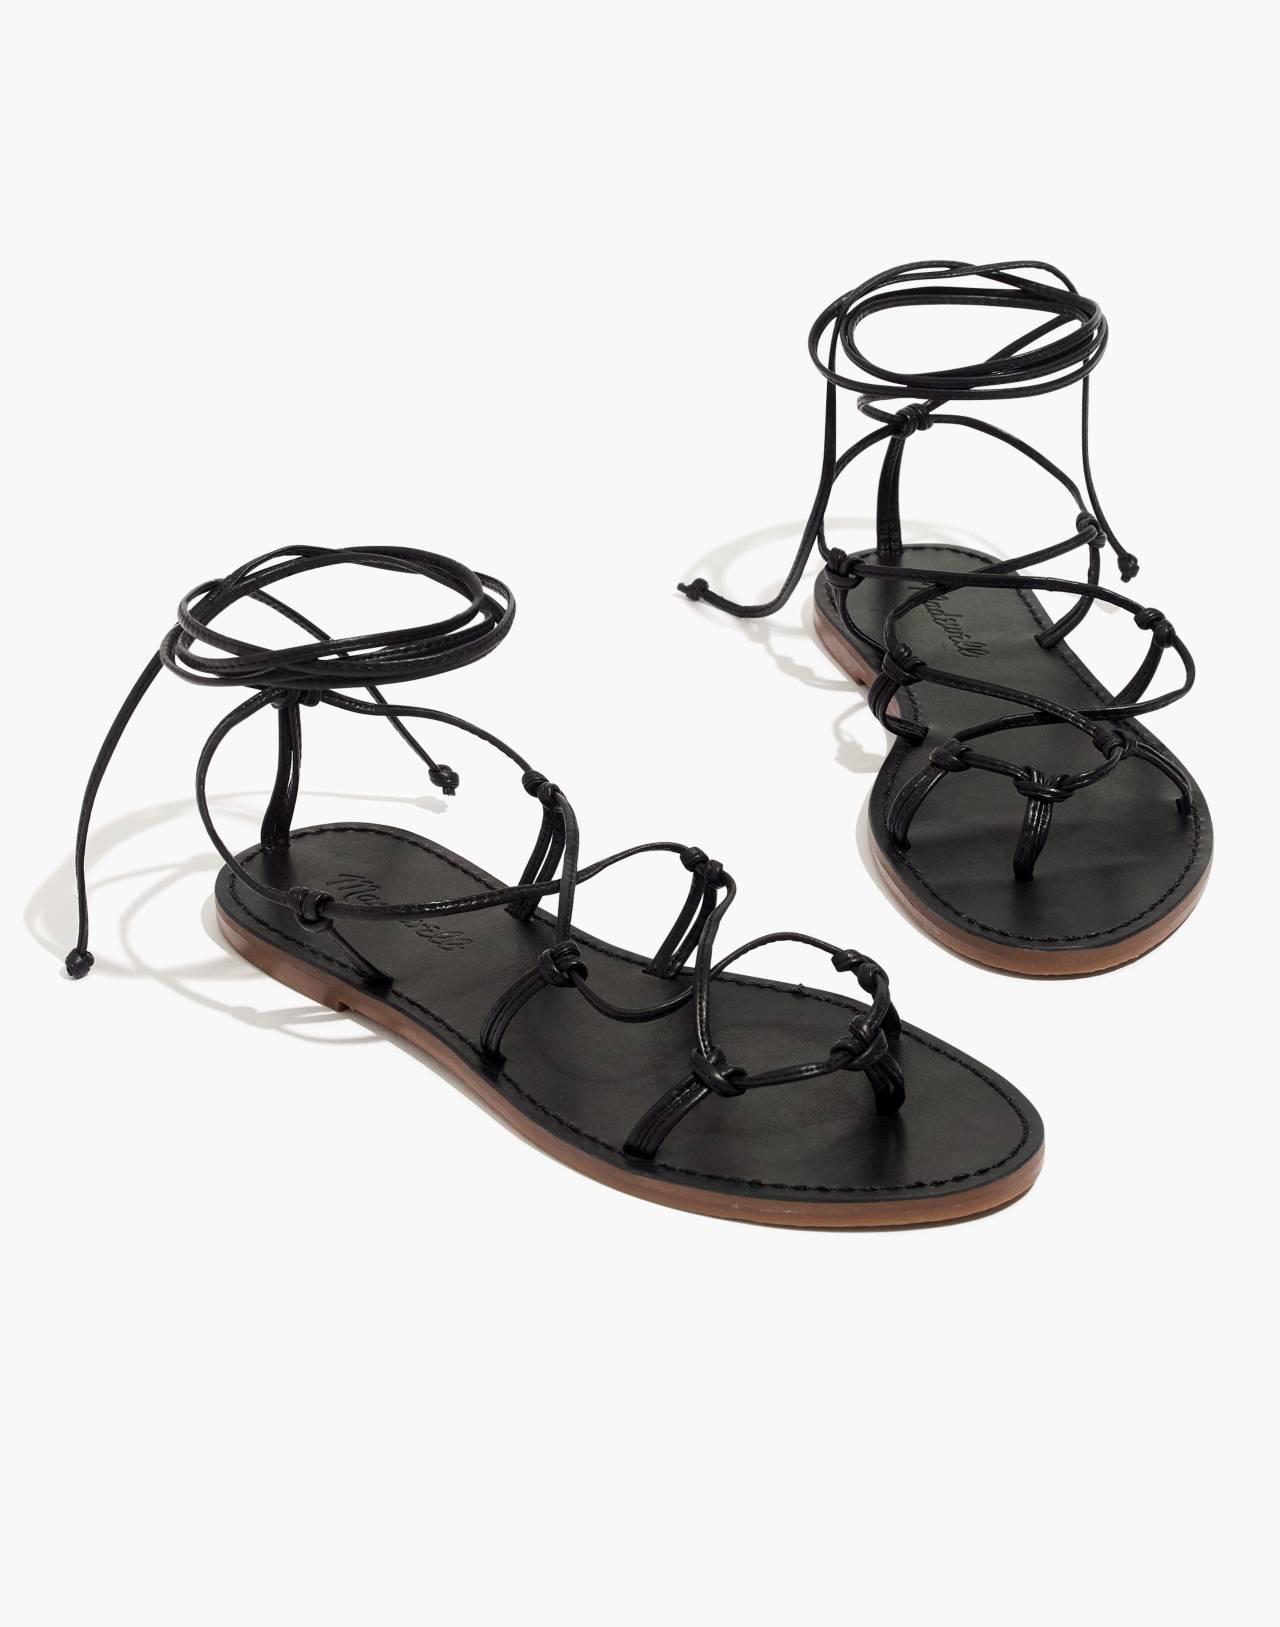 The Boardwalk Lace-Up Sandal in true black image 1